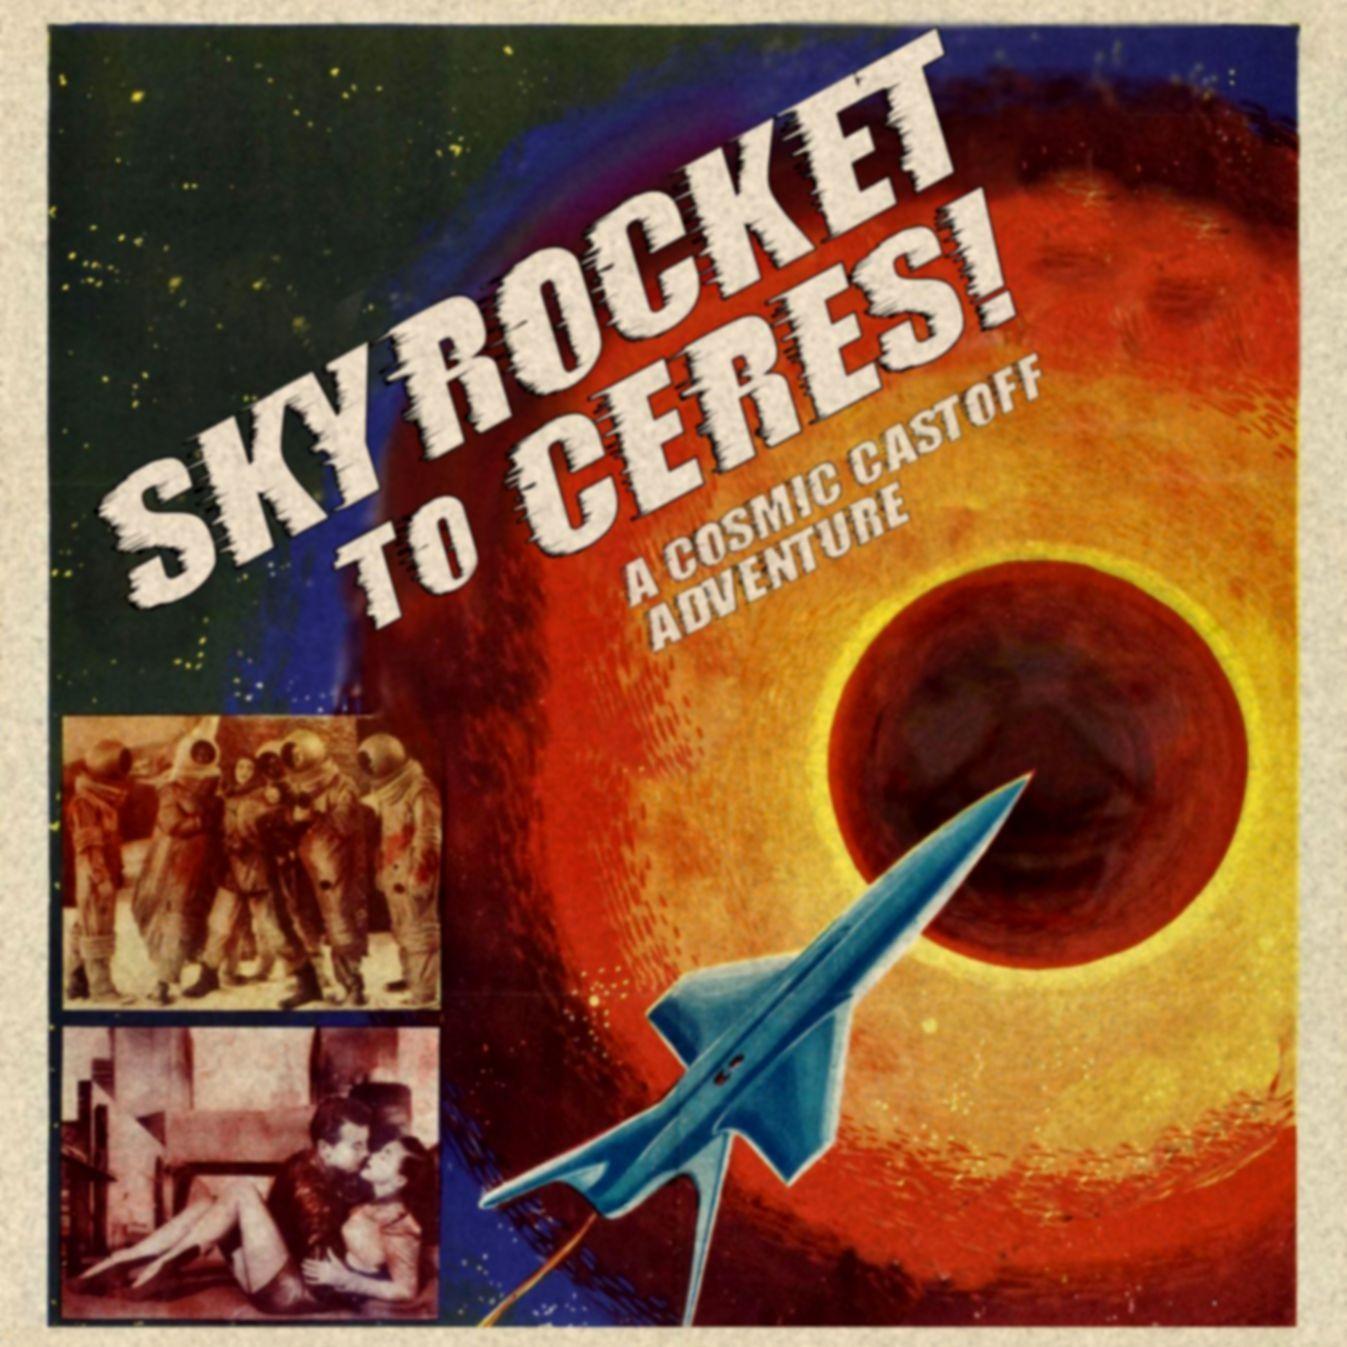 Skyrocket to Ceres!